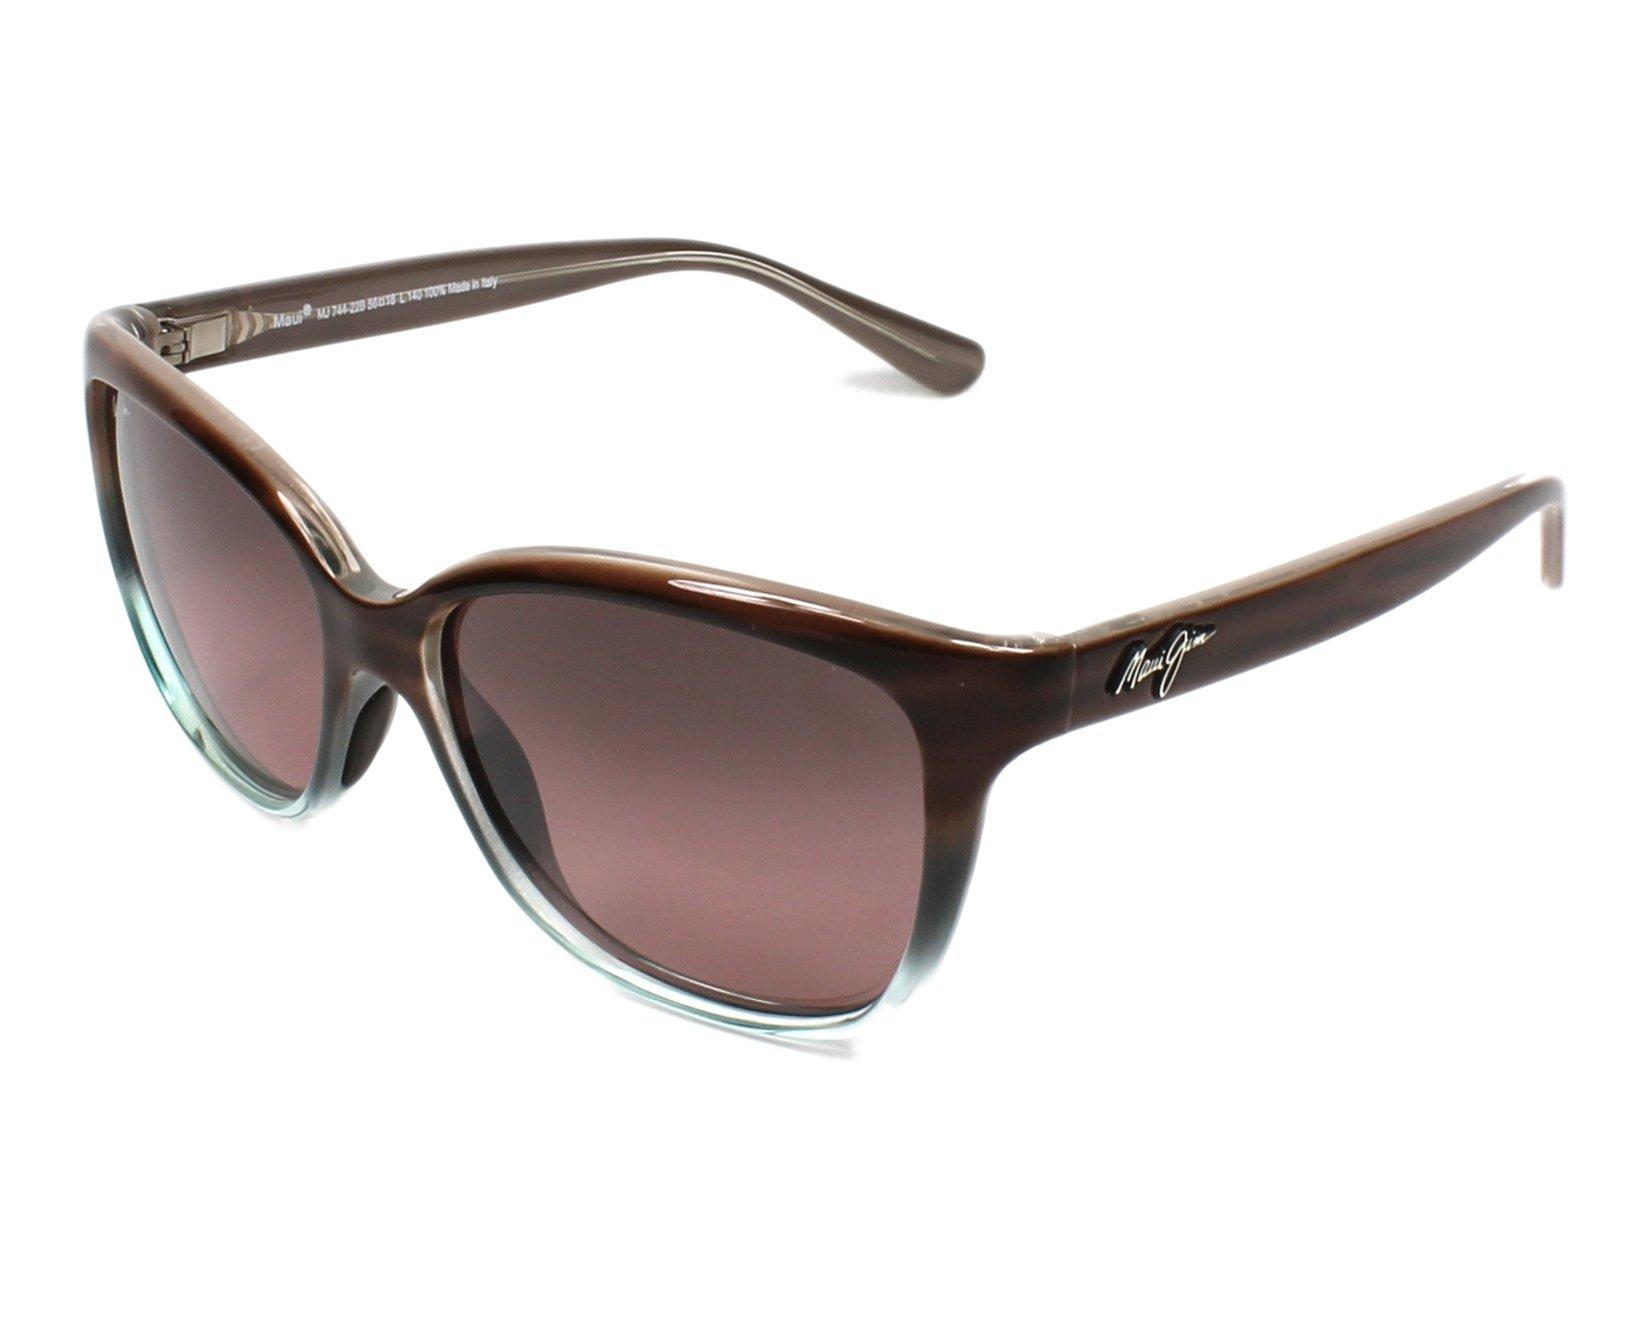 43b878d6a2b Sunglasses Maui Jim RS-744 22B - Brown Turquoise profile view